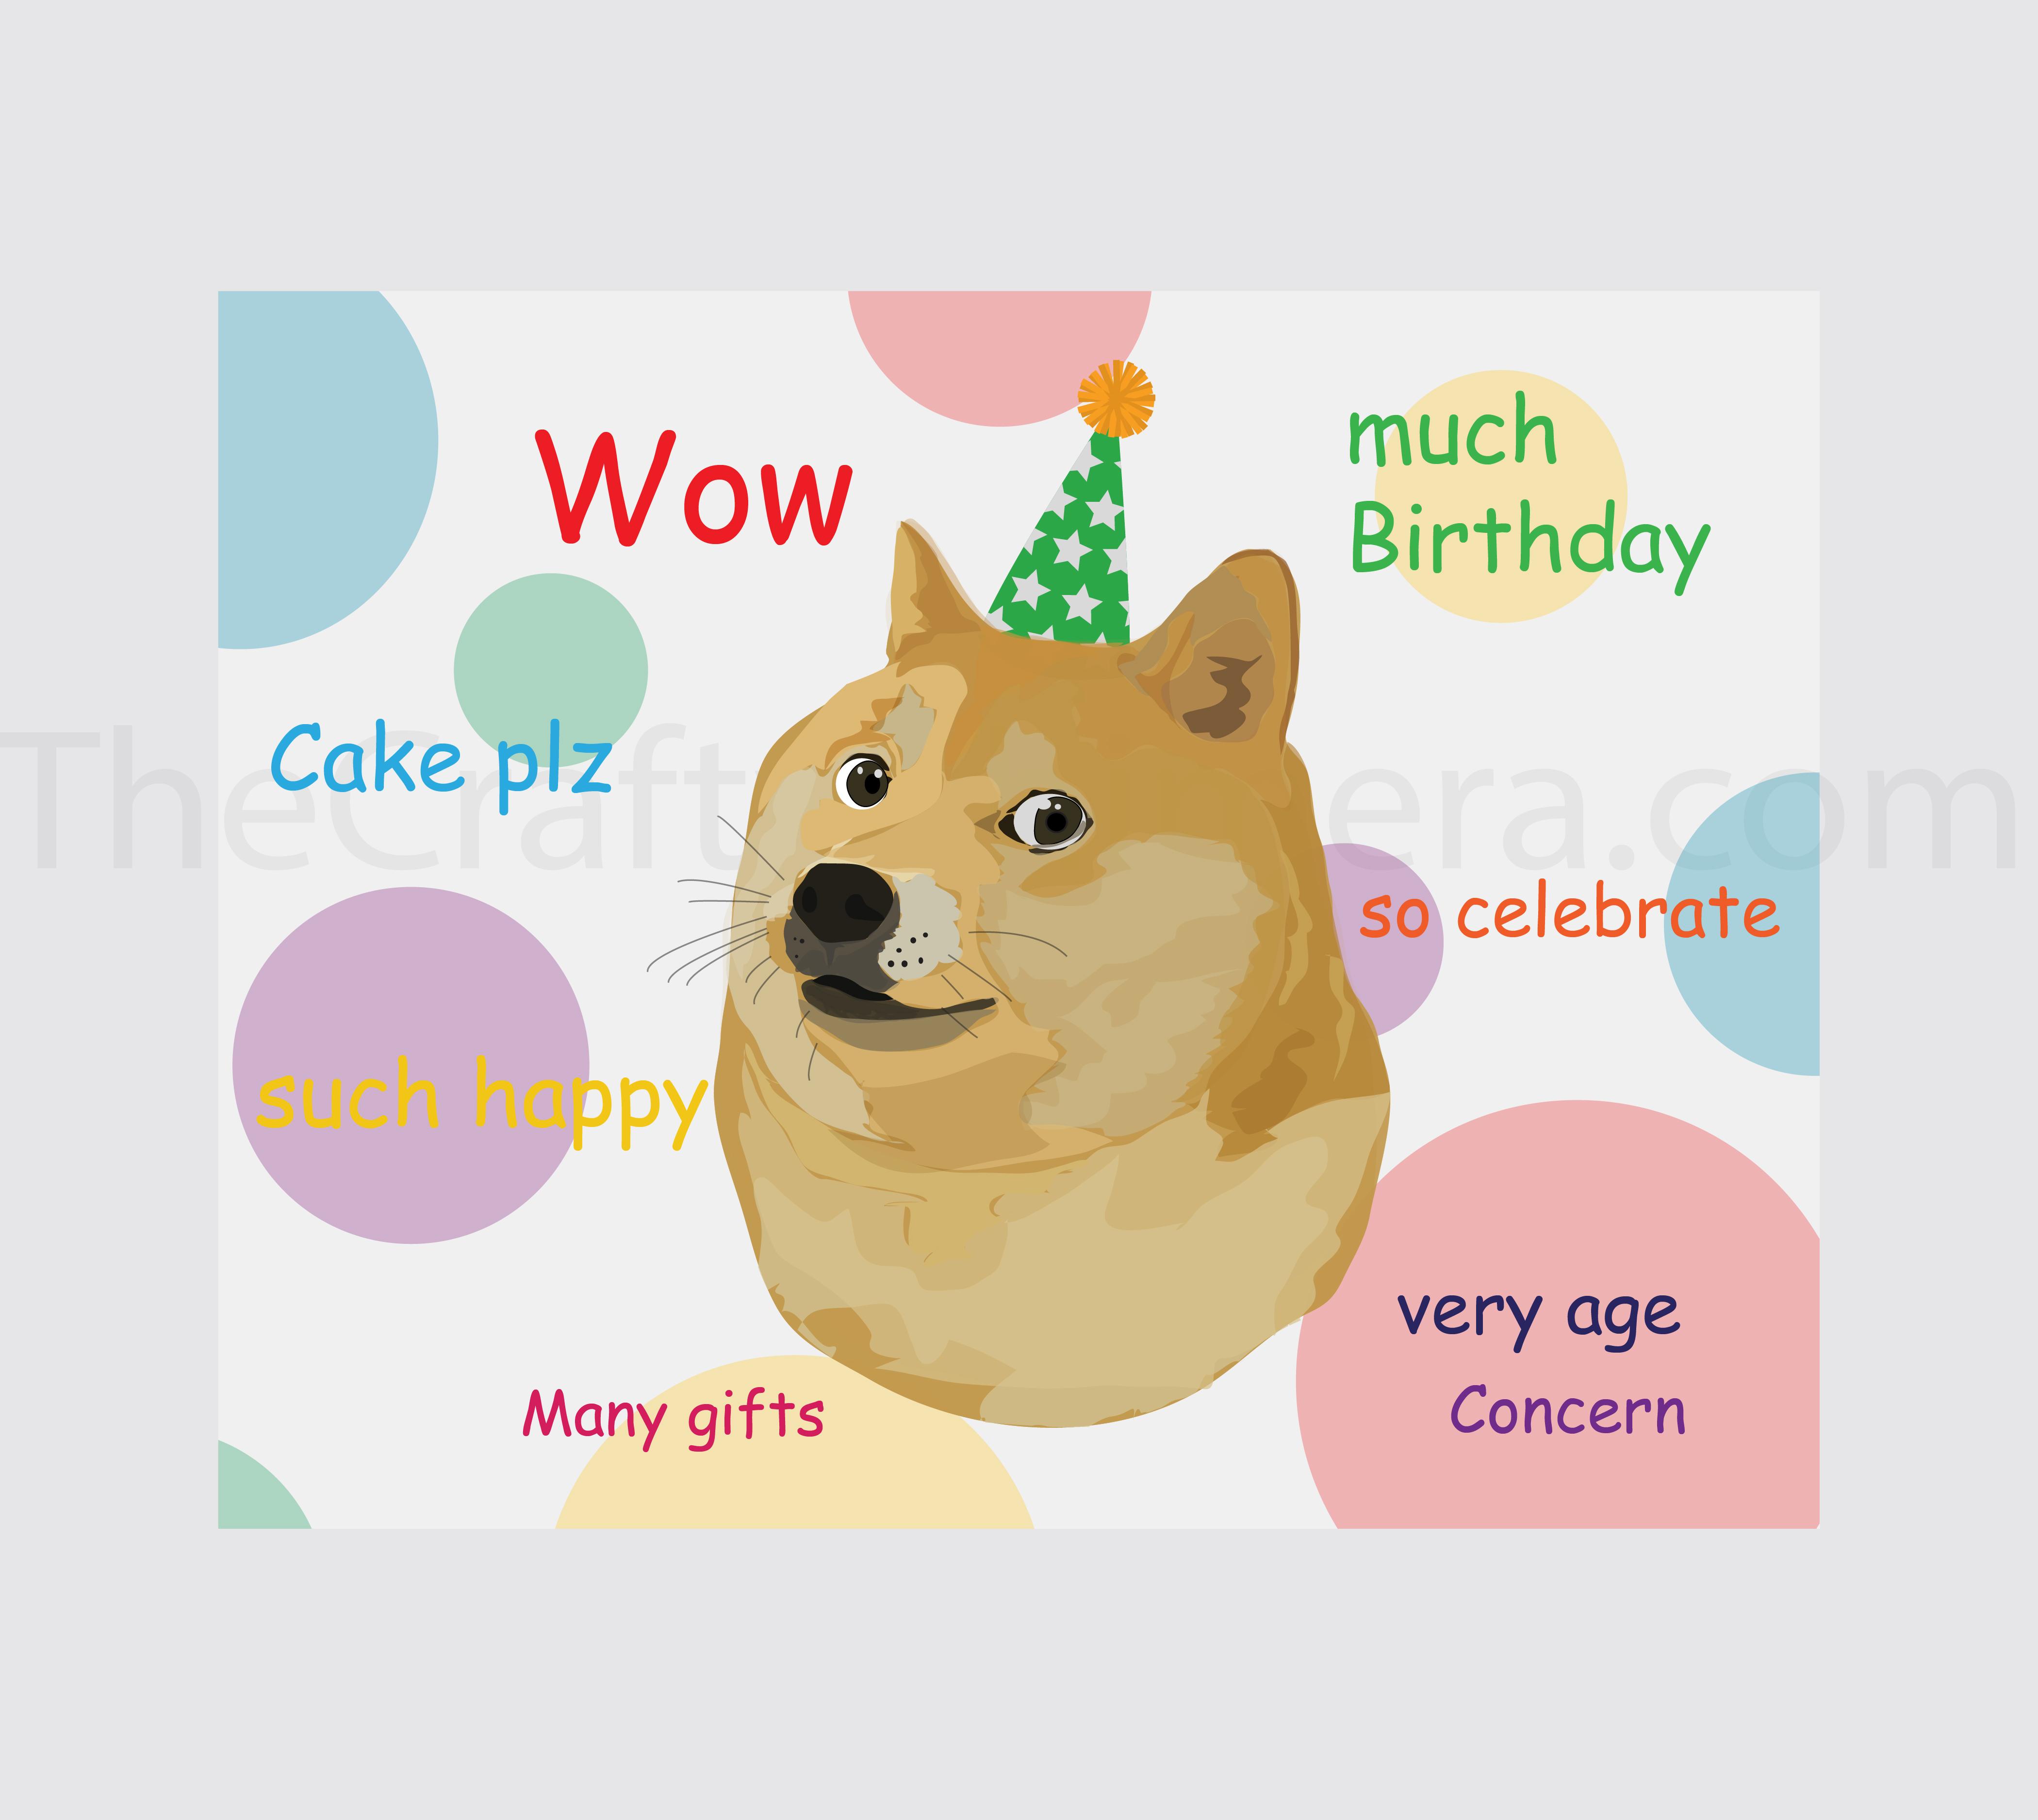 Doge Meme Funny Birthday Card  Etsy